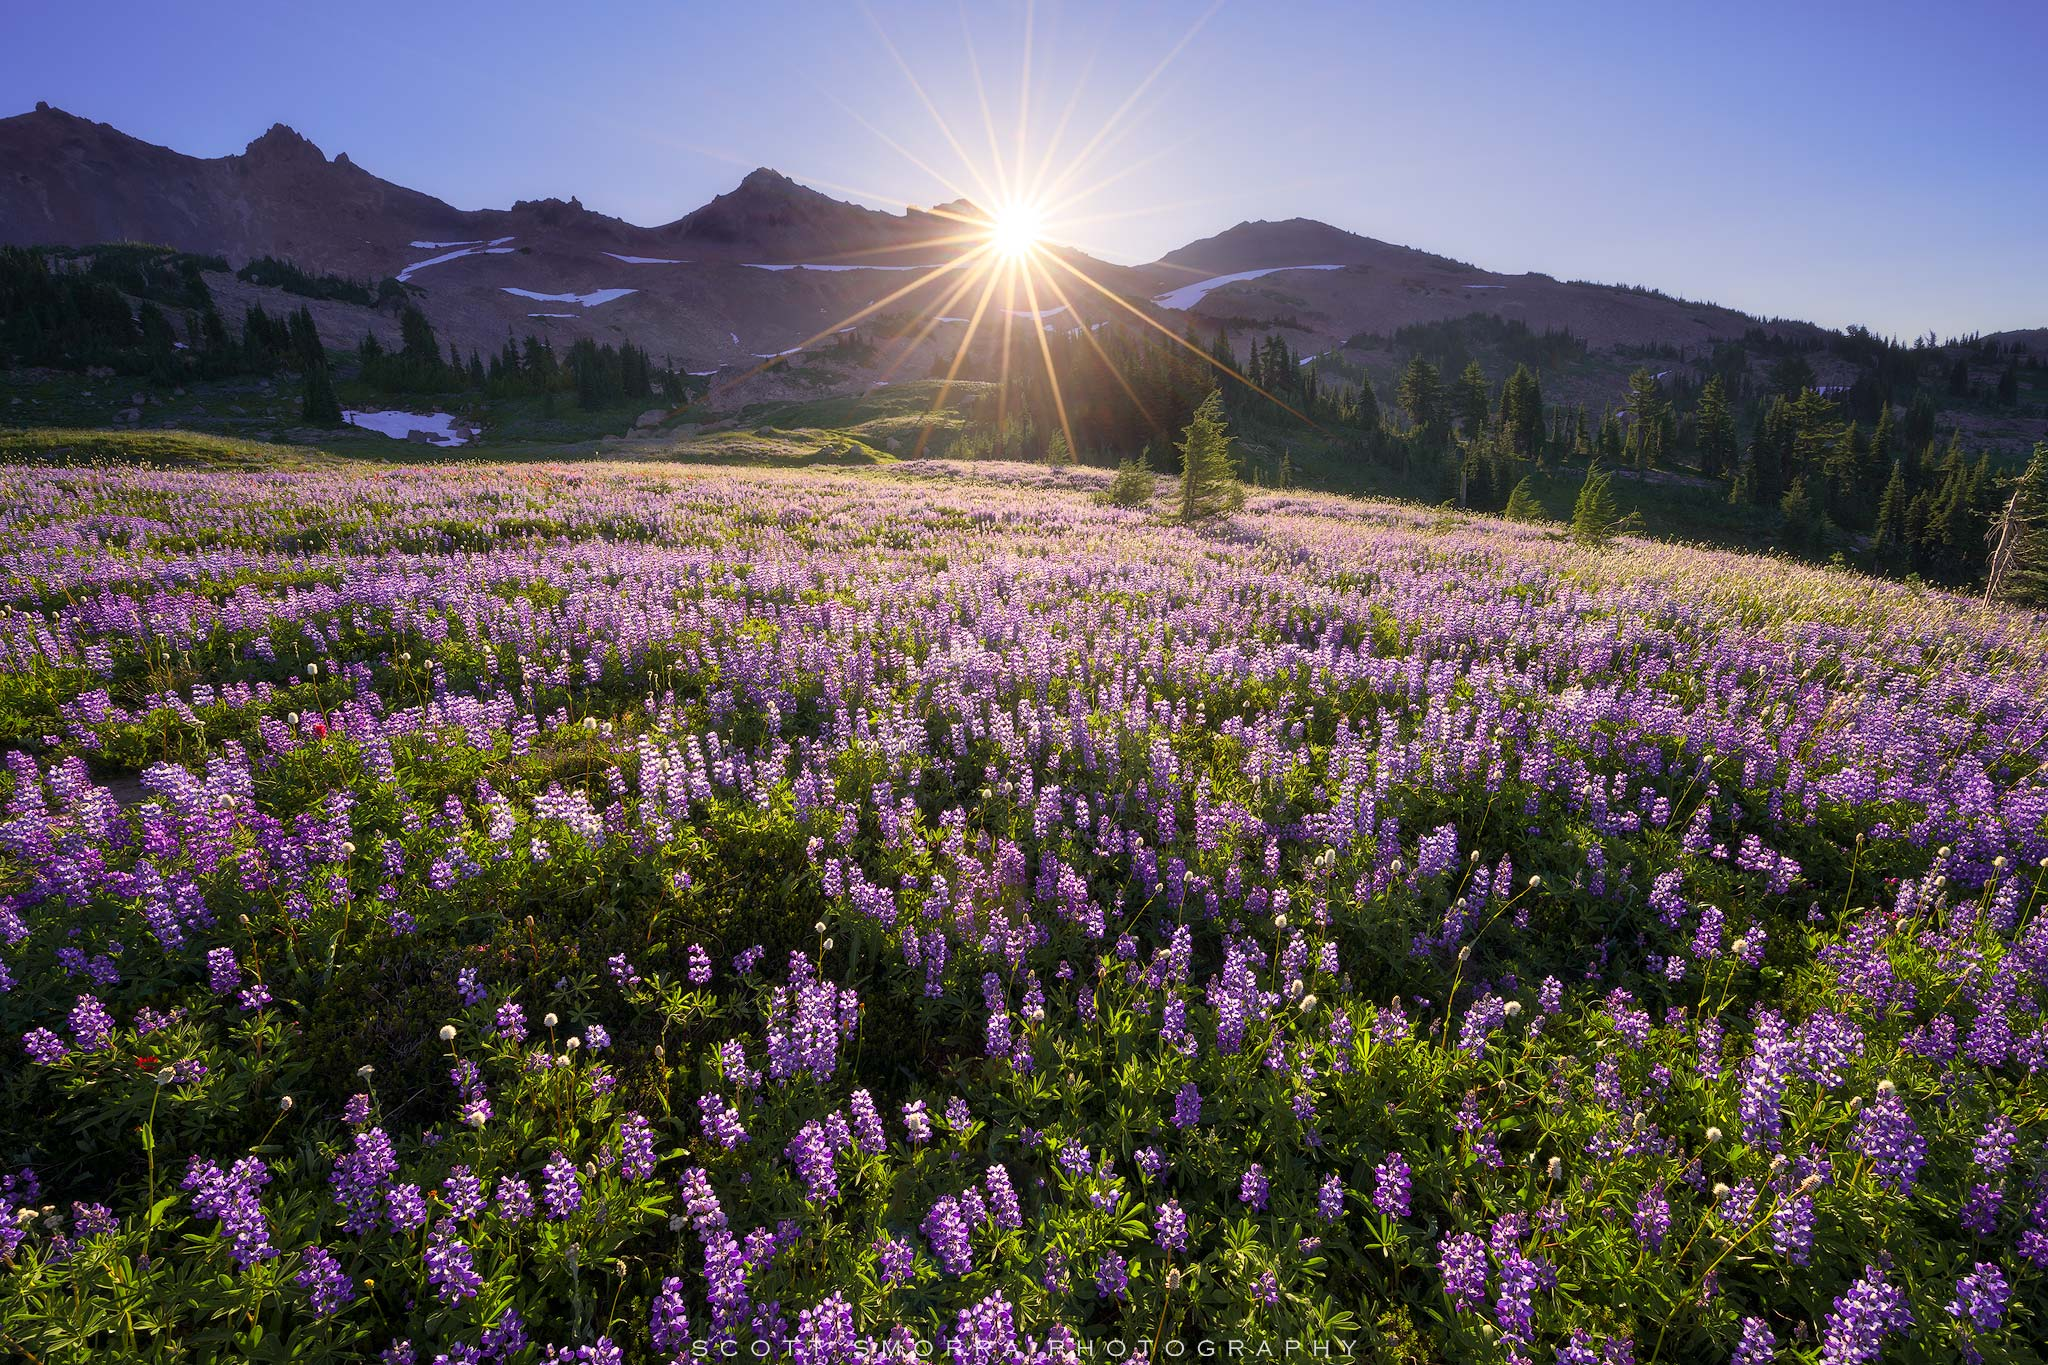 Washington, Goat Rocks Wilderness,  summer, sunrise, wildflowers, lupine, photo